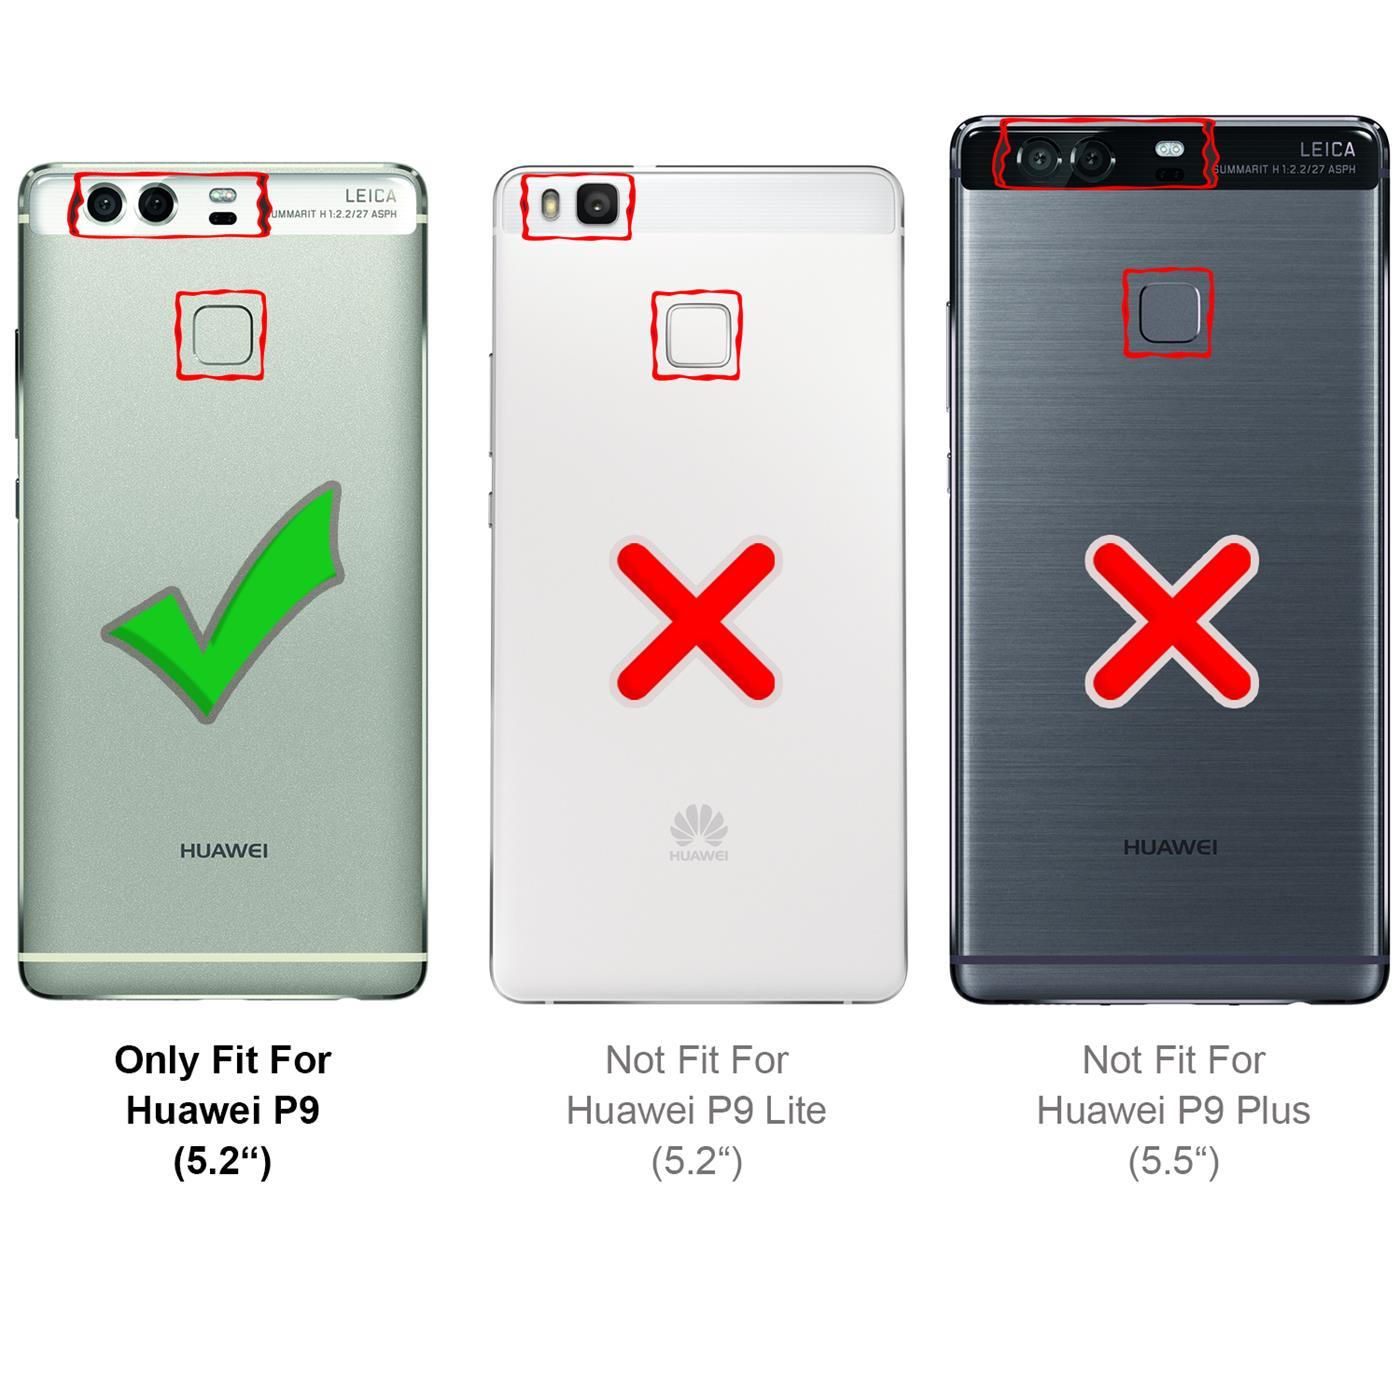 Hard-Back-Case-Cover-Huawei-p10-duenn-Cover-Slim-Shockproof-Rugged Indexbild 19